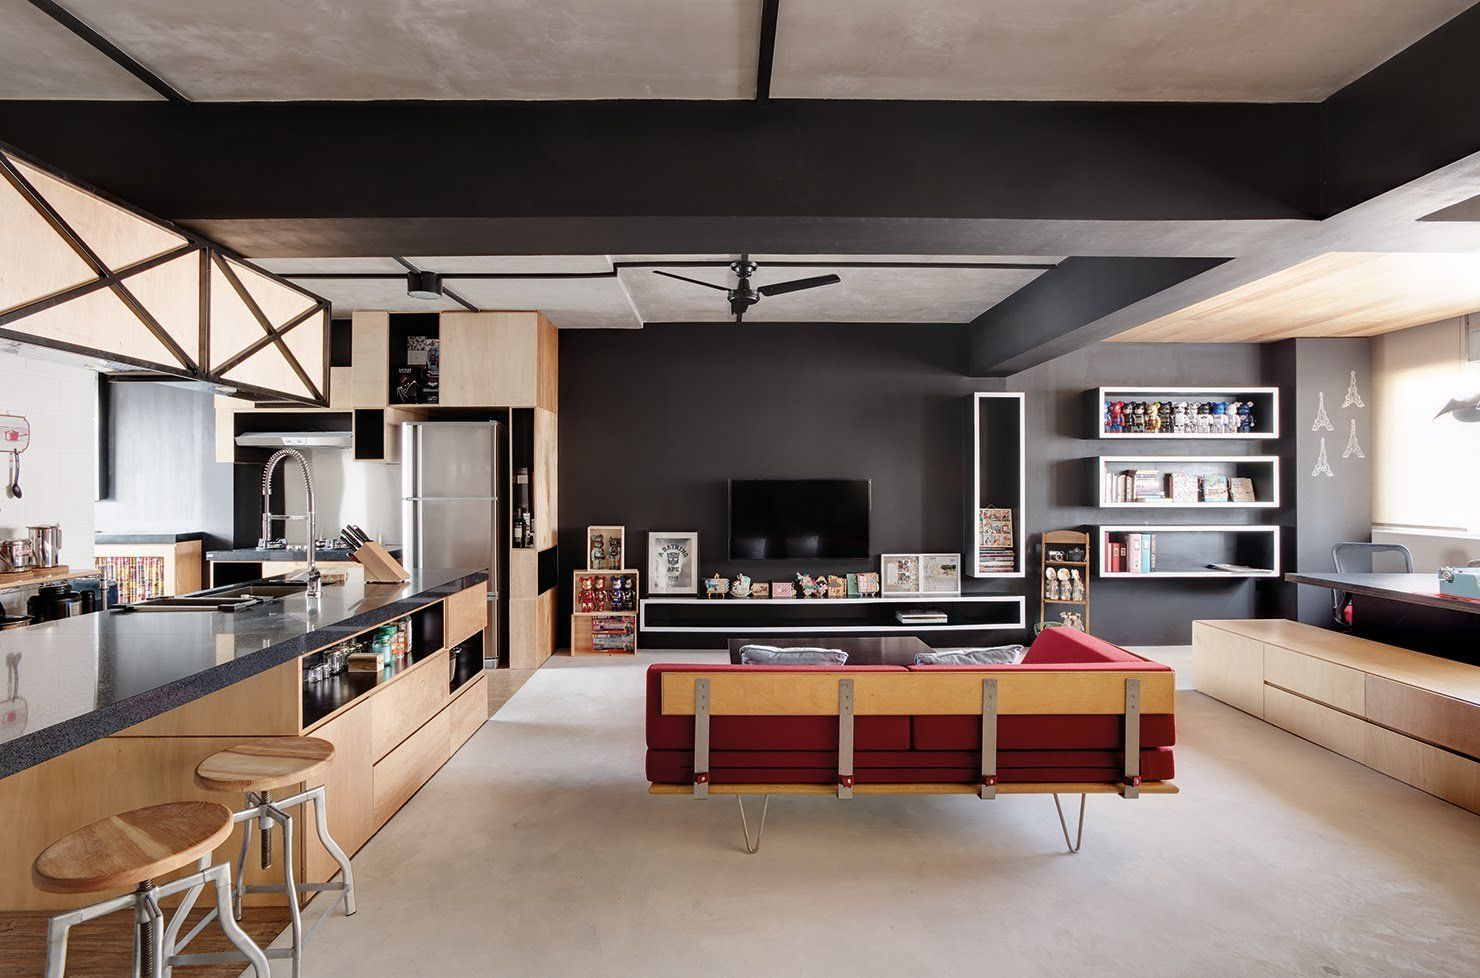 Modern Home Interior Design No Internal Walls 675x446 15 Top